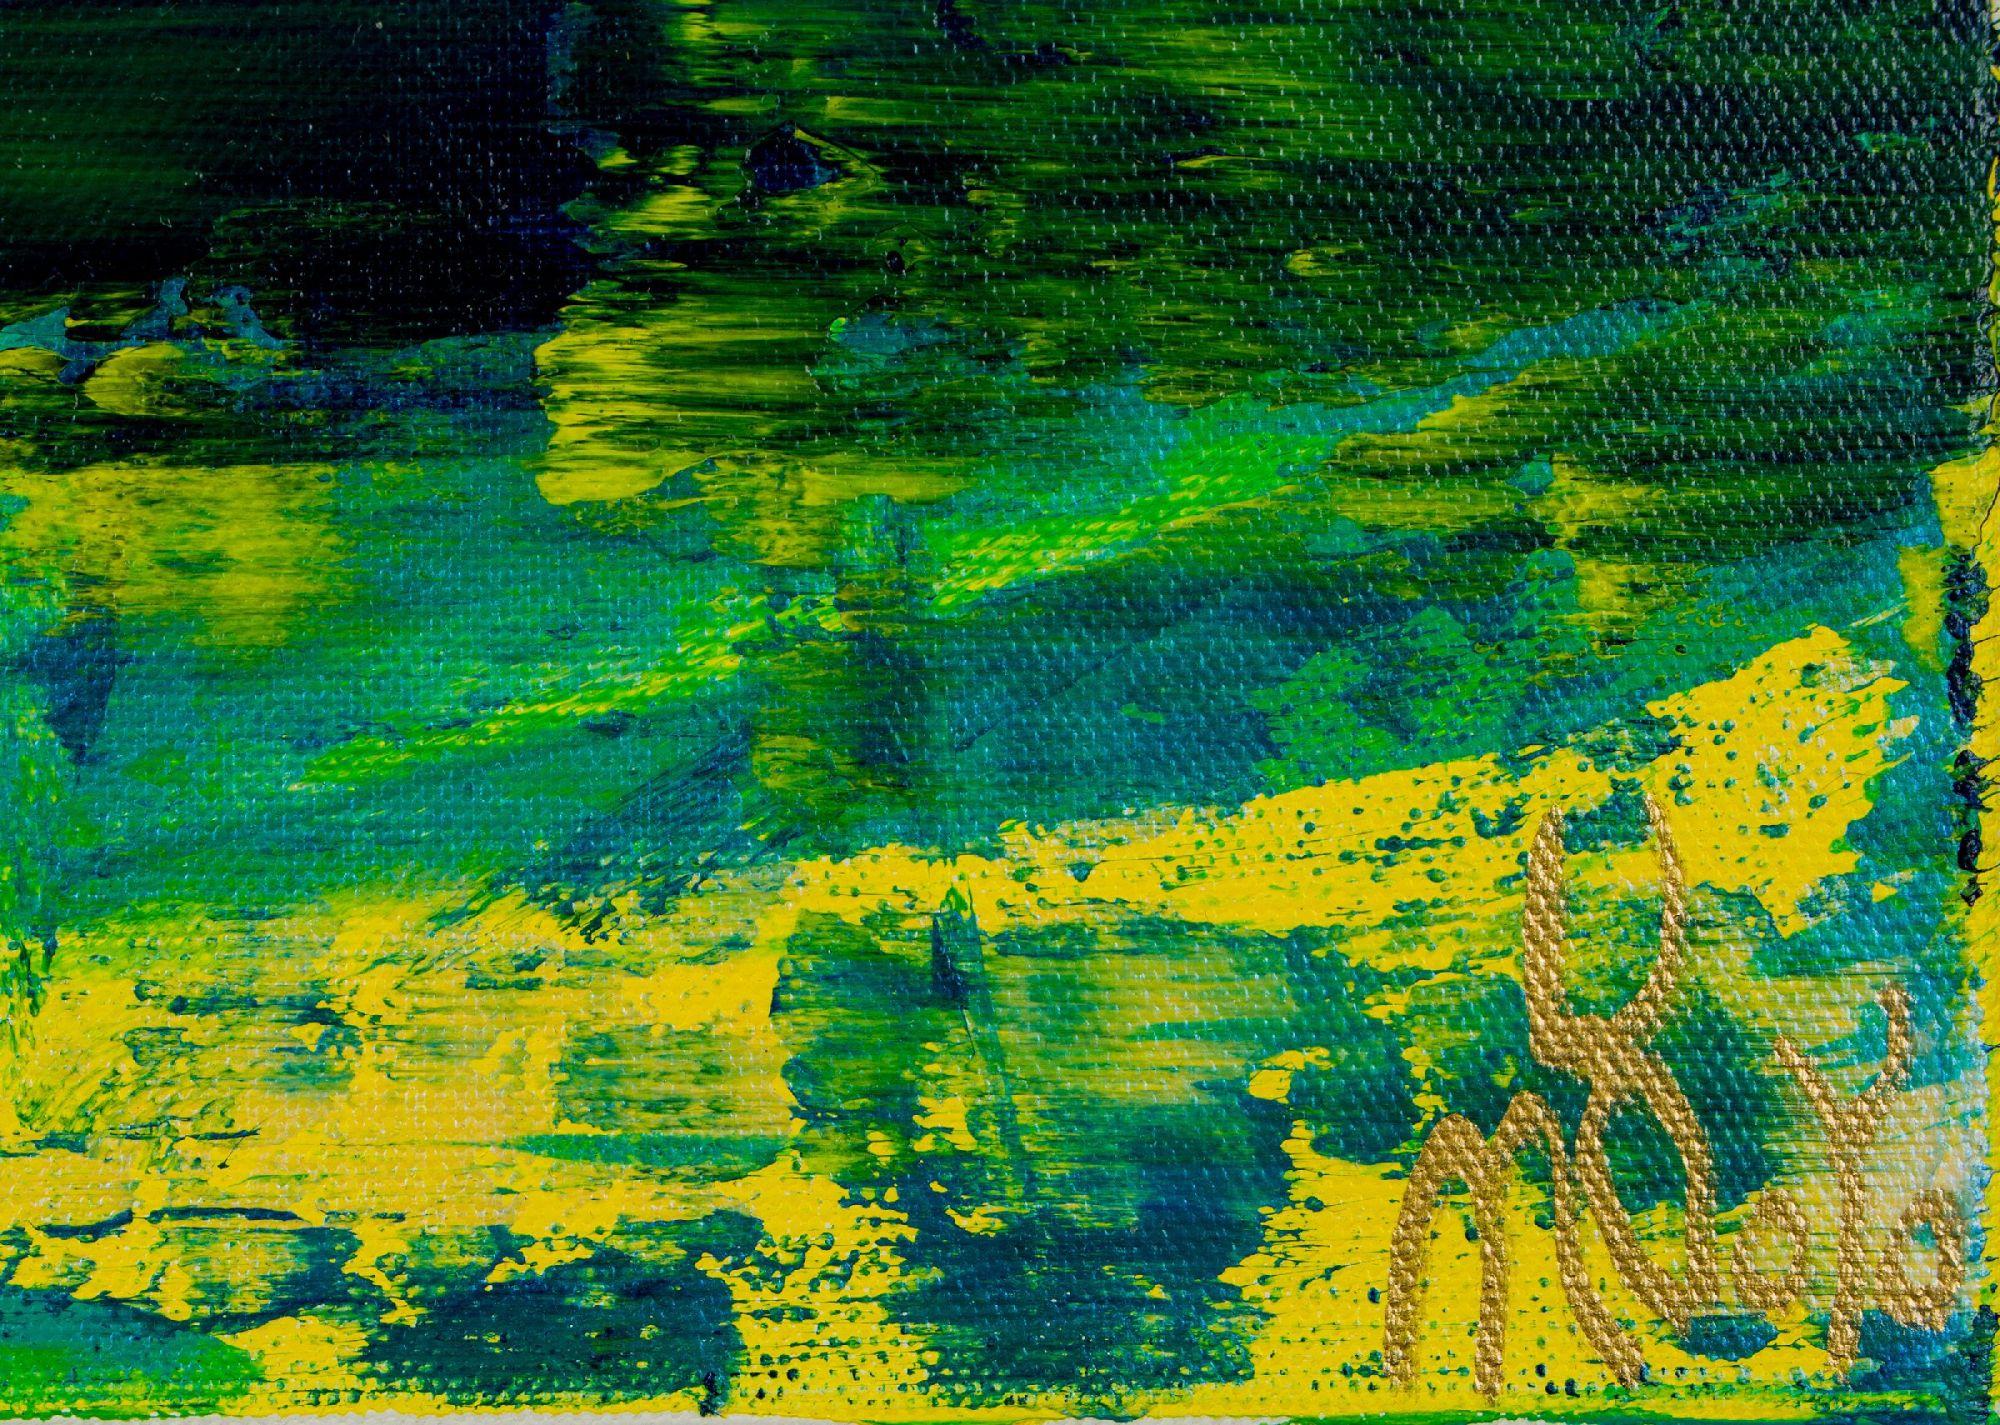 Signature close up / Mountain Terrain (Sunset - Sunrise) 2020 by Nestor Toro / SOLD